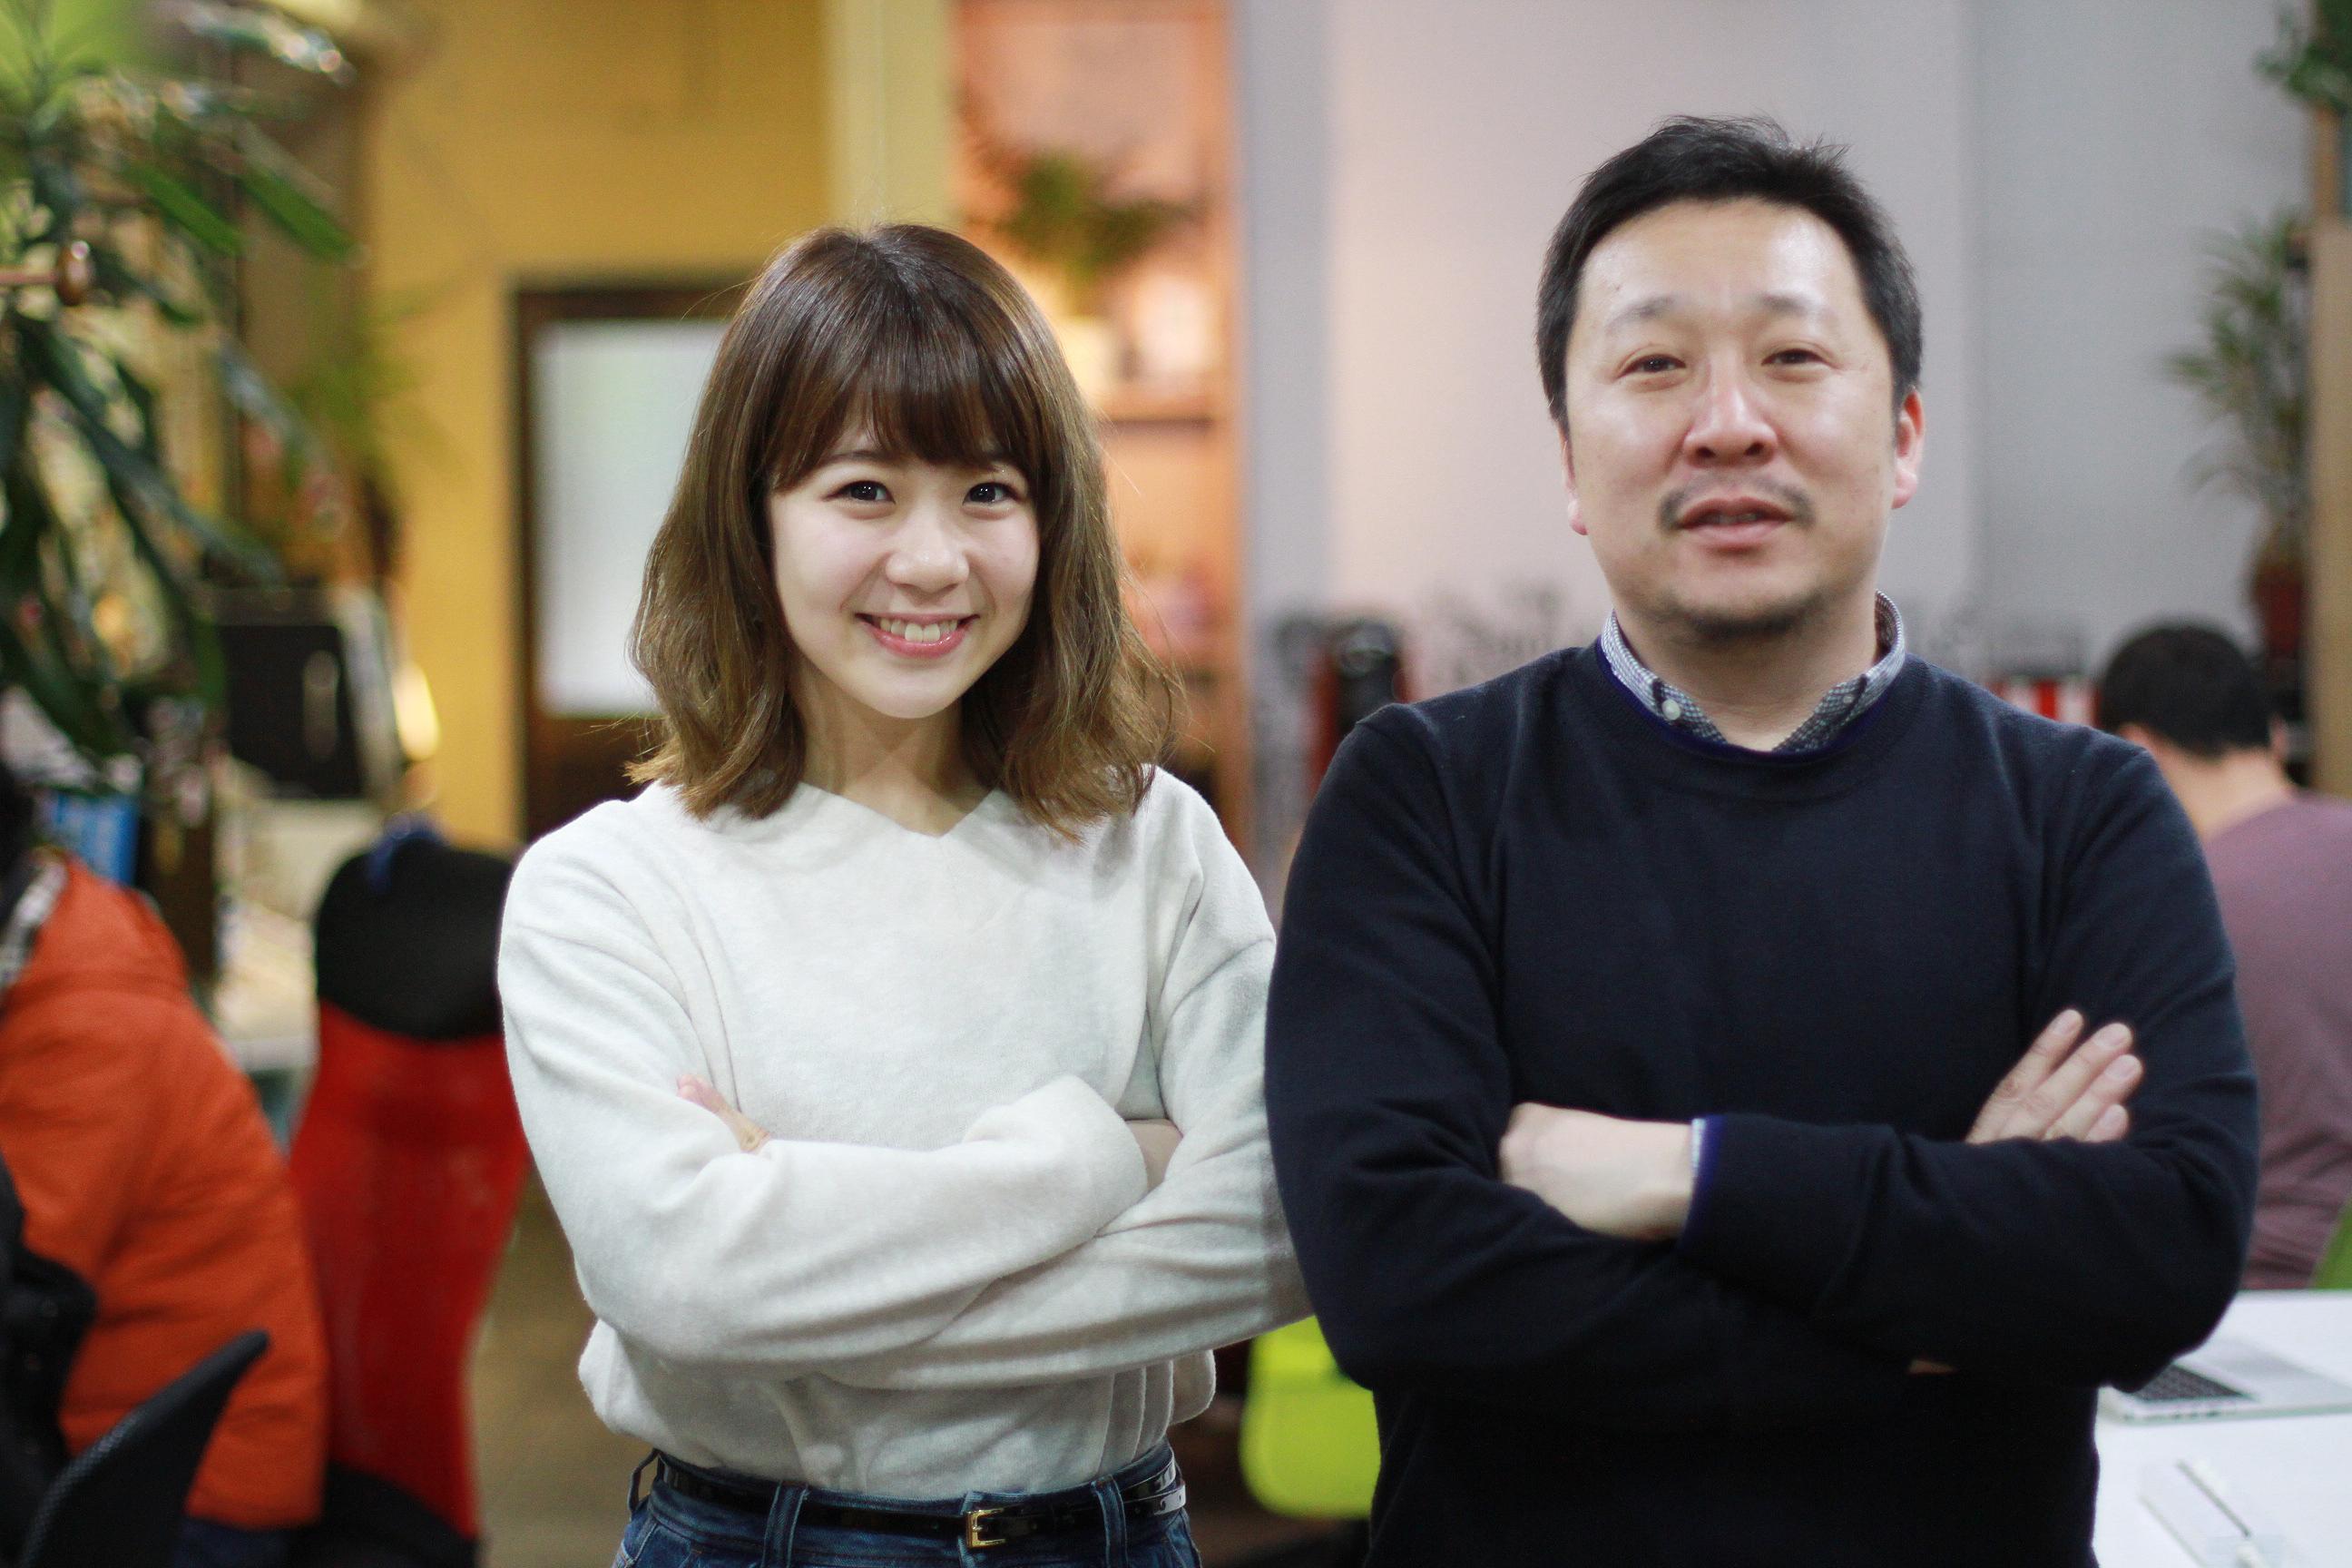 VACANCYガールが道案内「最寄り駅からの道のり」〜大崎駅編〜